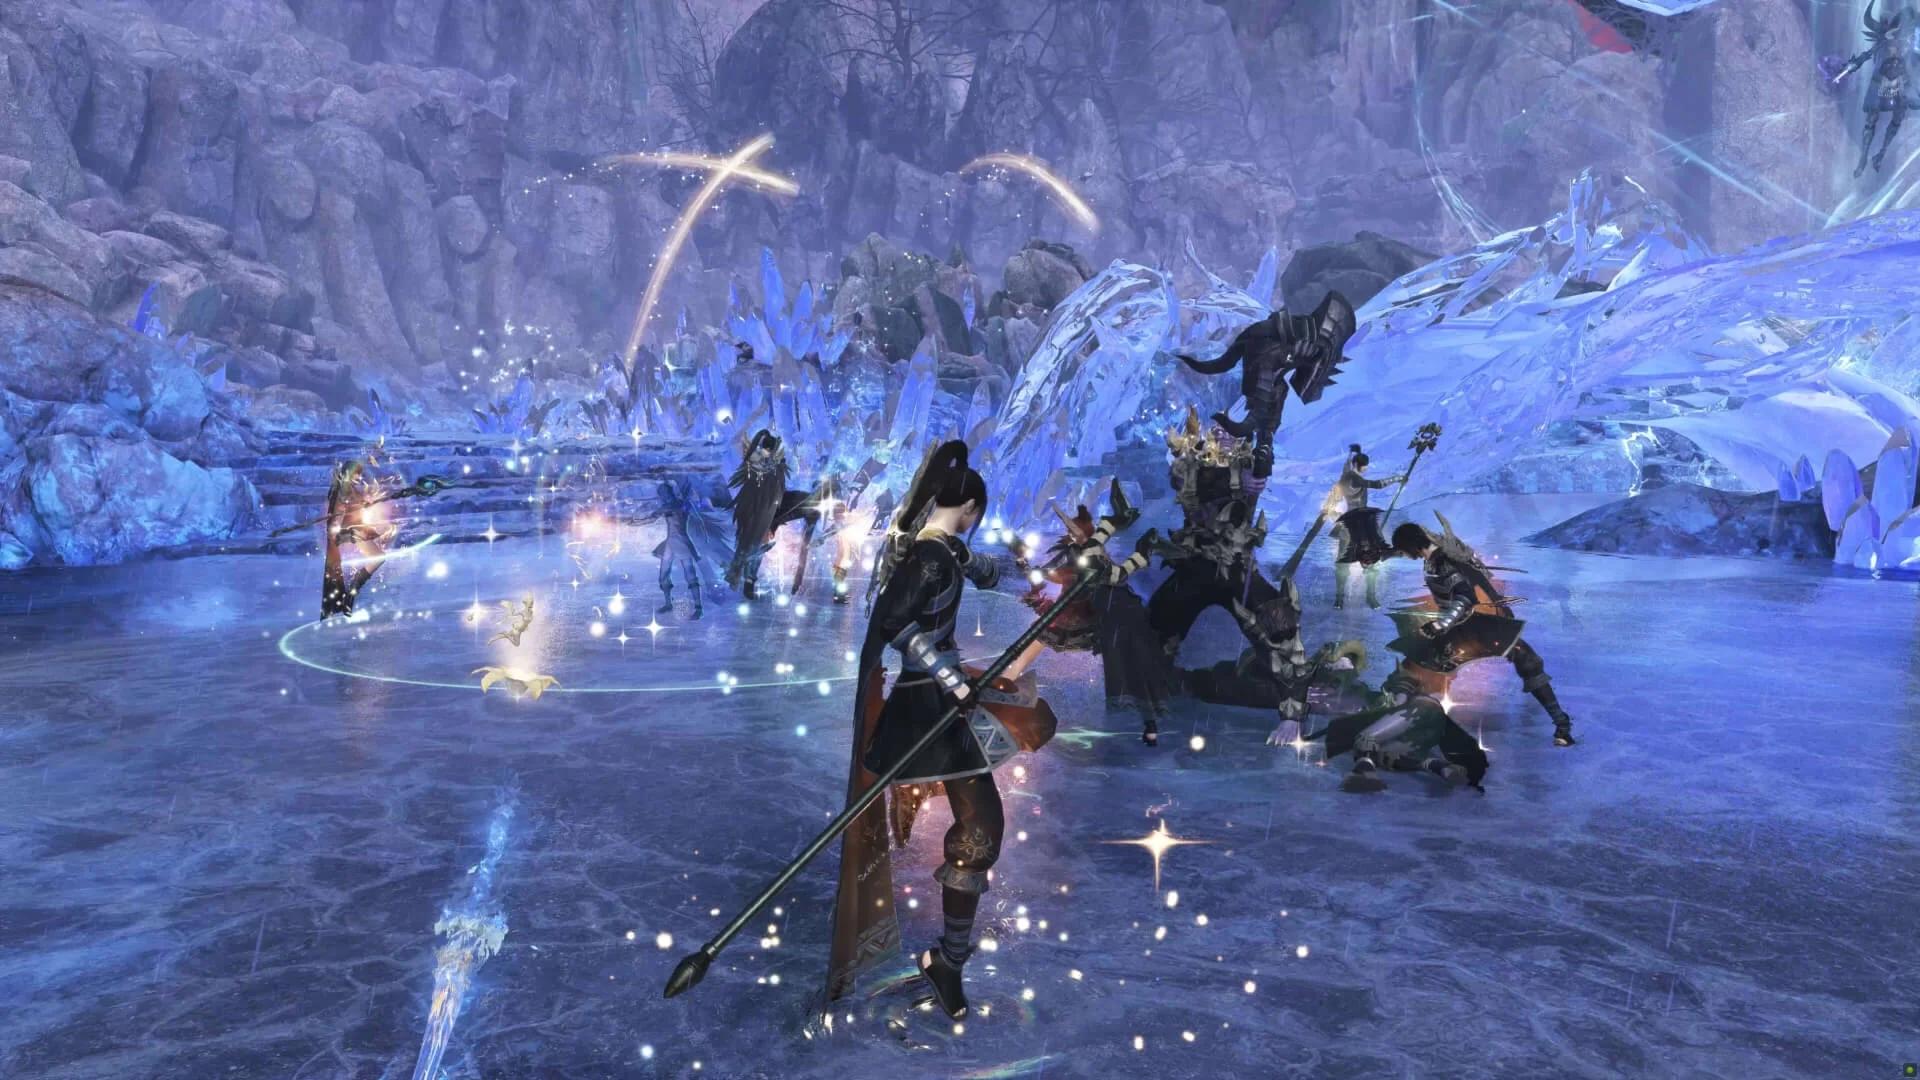 swords-of-legends-online-review-03-part-2